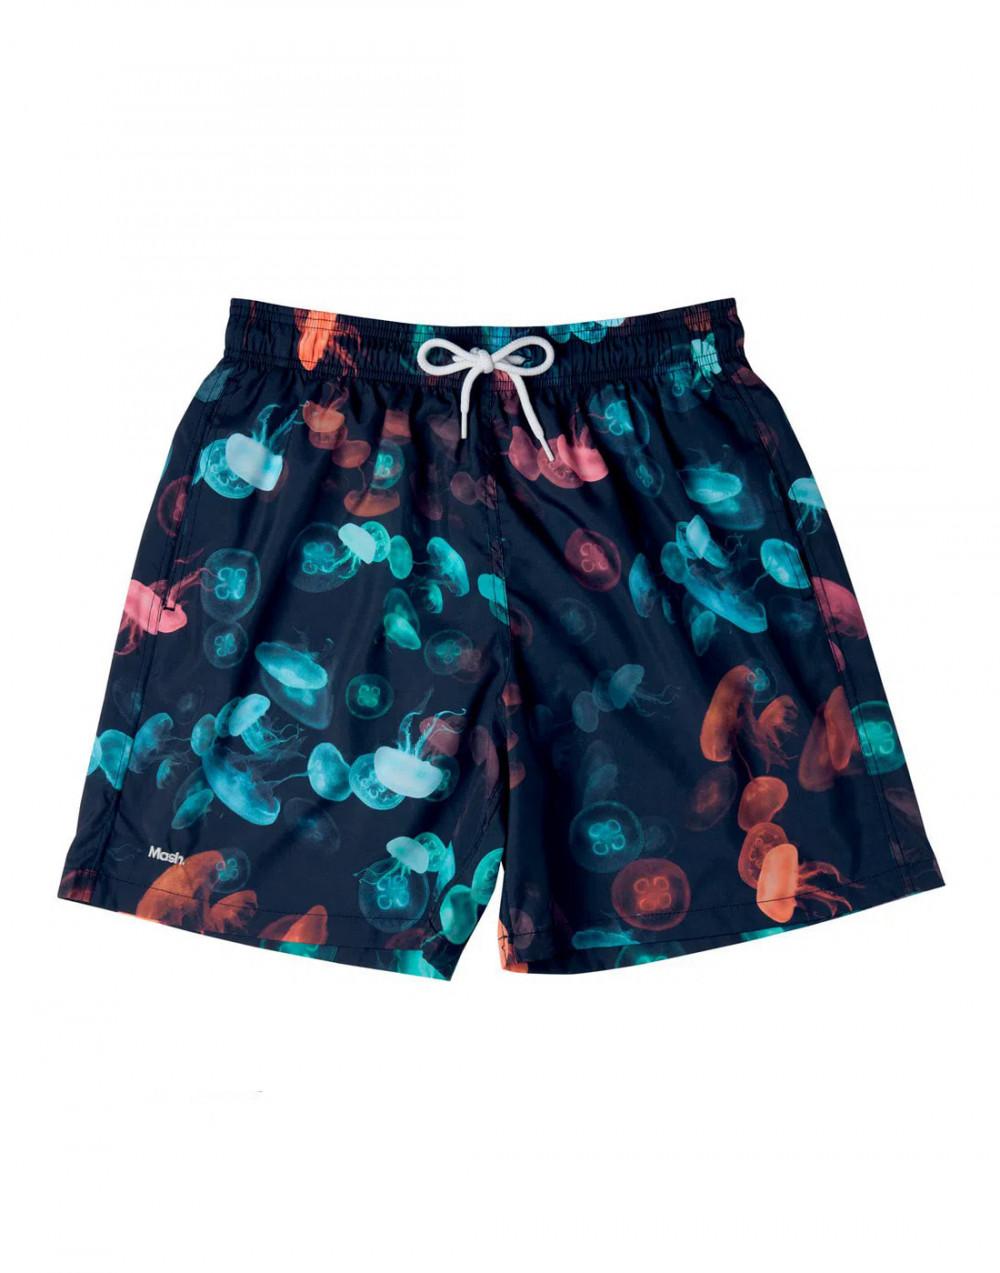 Shorts Estampado Água Viva e Corais FPS 30 Mash